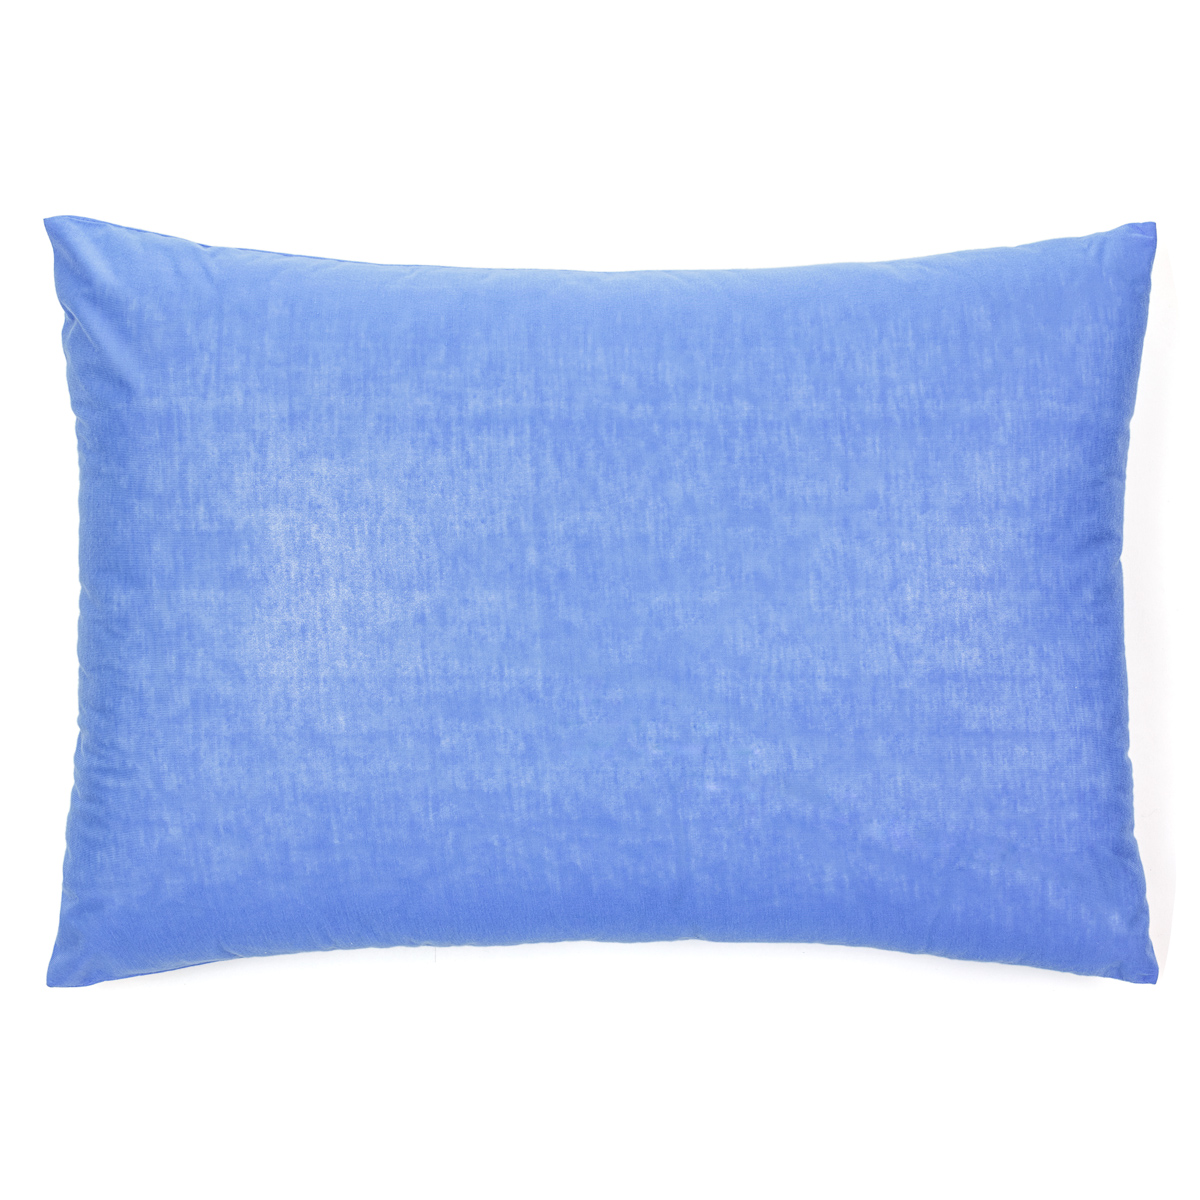 Наволочки Эко-сон Белый р. 48х68Для комфортного сна, отдыха и работы<br><br><br>Тип: Наволочки<br>Размер: 48х68<br>Материал: Тенсел